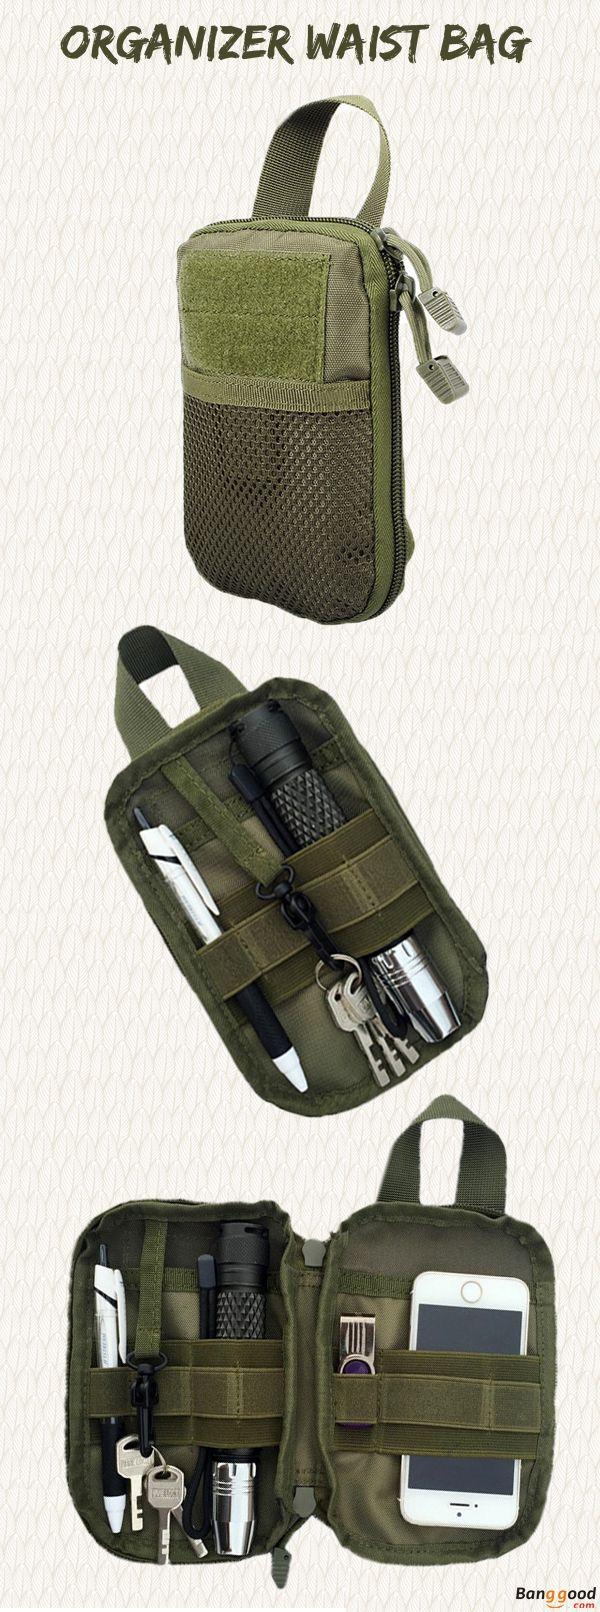 US$8.99 + Free shipping. Men's Waist Bag, Men Military Bag, EDC Pouch, Mesh Tools Bag, Accessories Organizer, Accessories Pouch, Tactical Waist Bag. Color: Black, Khaki, Army Green. Best Tools Organizer Ever.